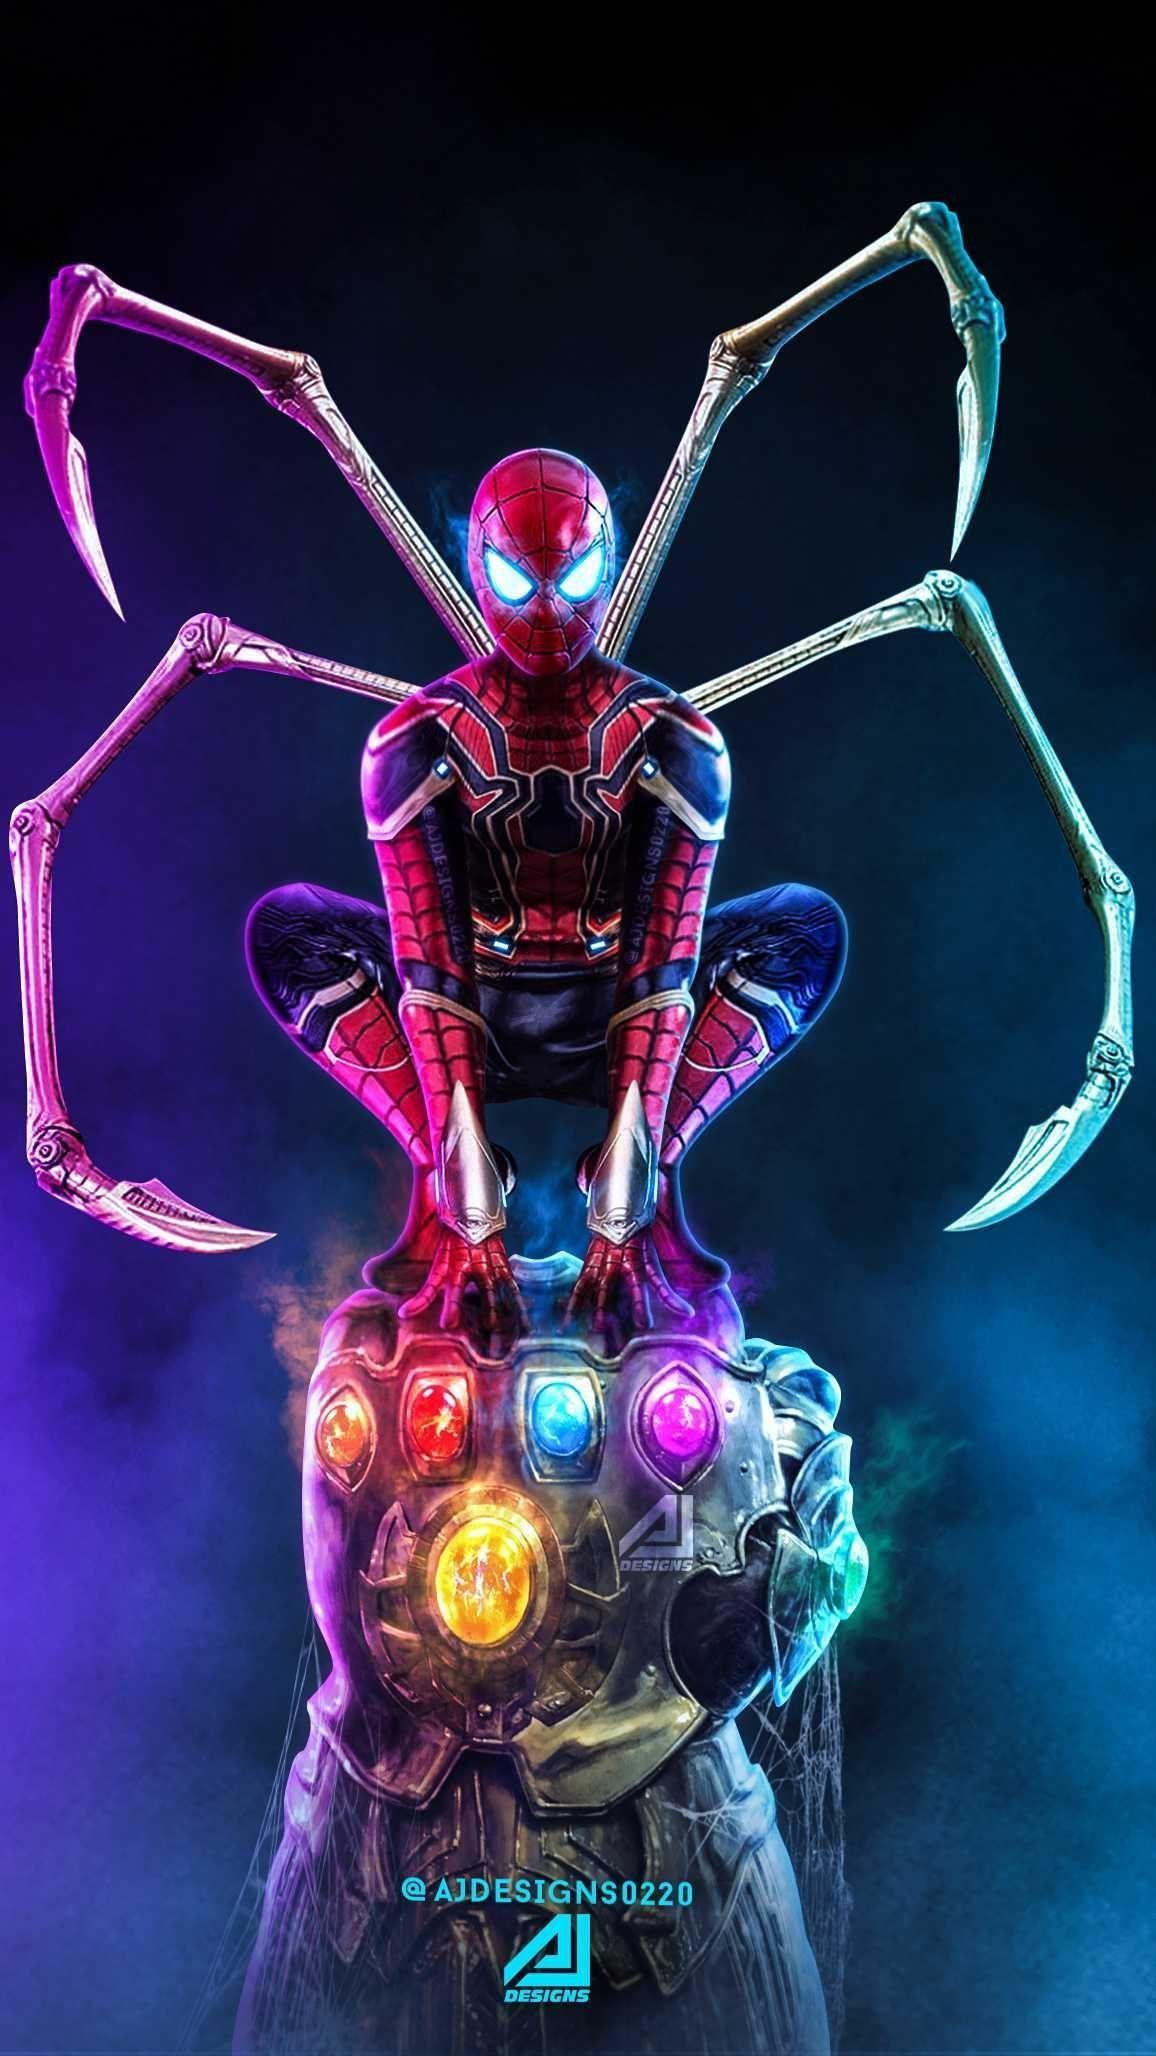 samsung wallpaper marvel iphone wallpaper men Thanos Vs Spider Man IPhone Wallpaper marvel